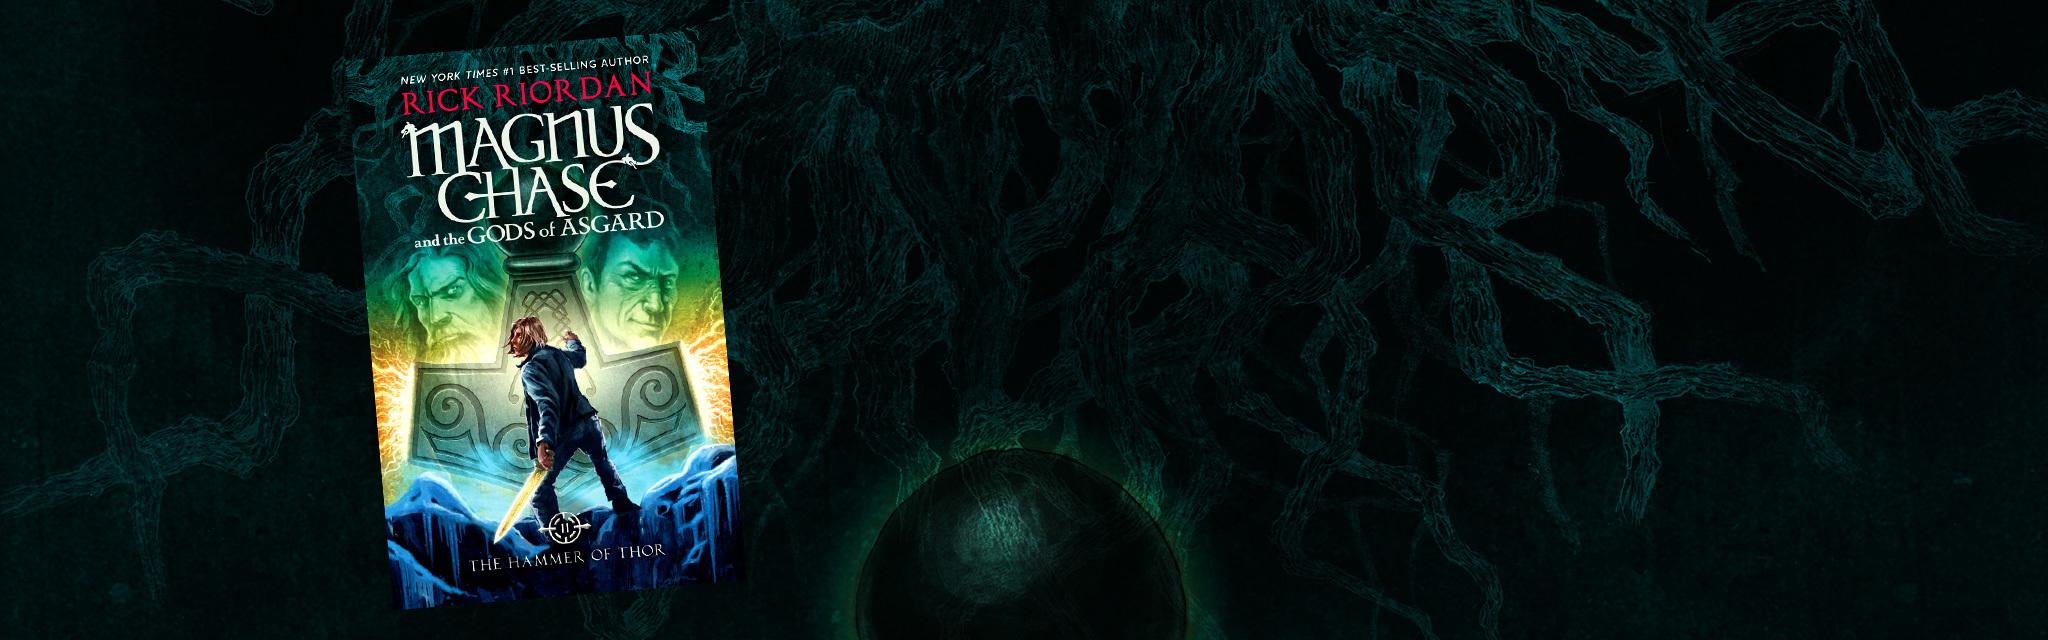 Magnus Chase - The Hammer Of Thor - Hero